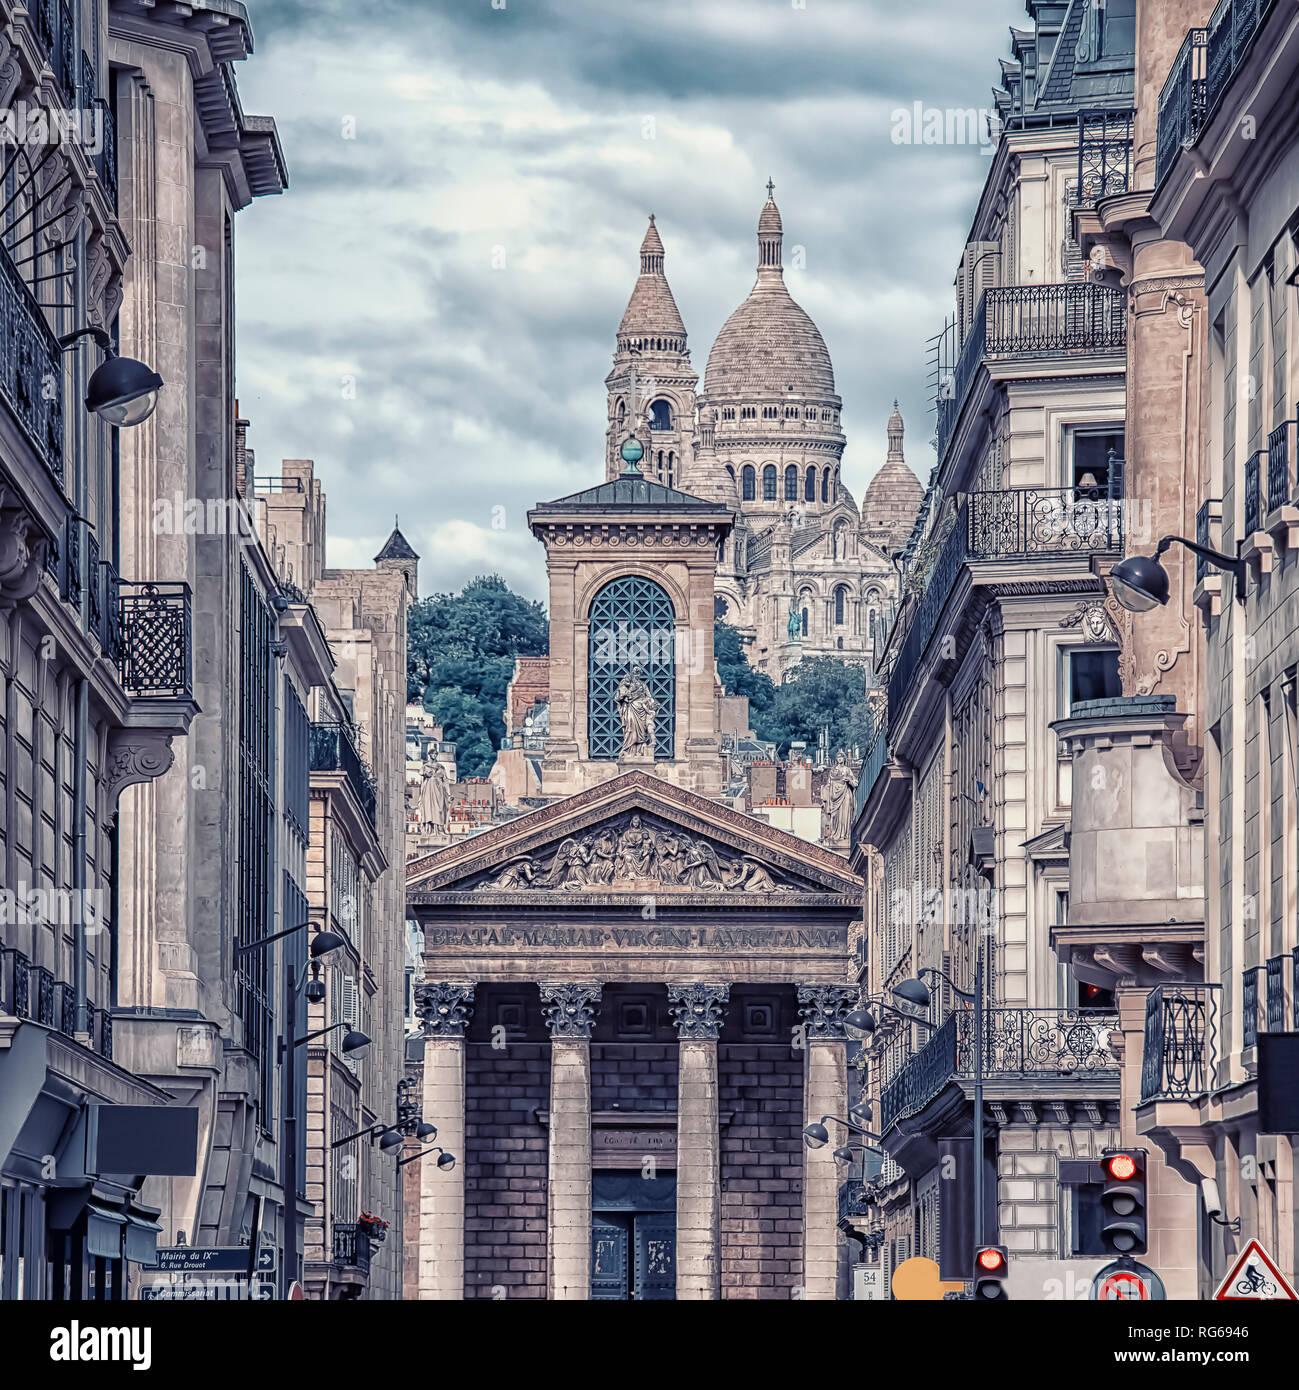 Sacre coeur viewed from Rue Laffitte street in Paris Stock Photo